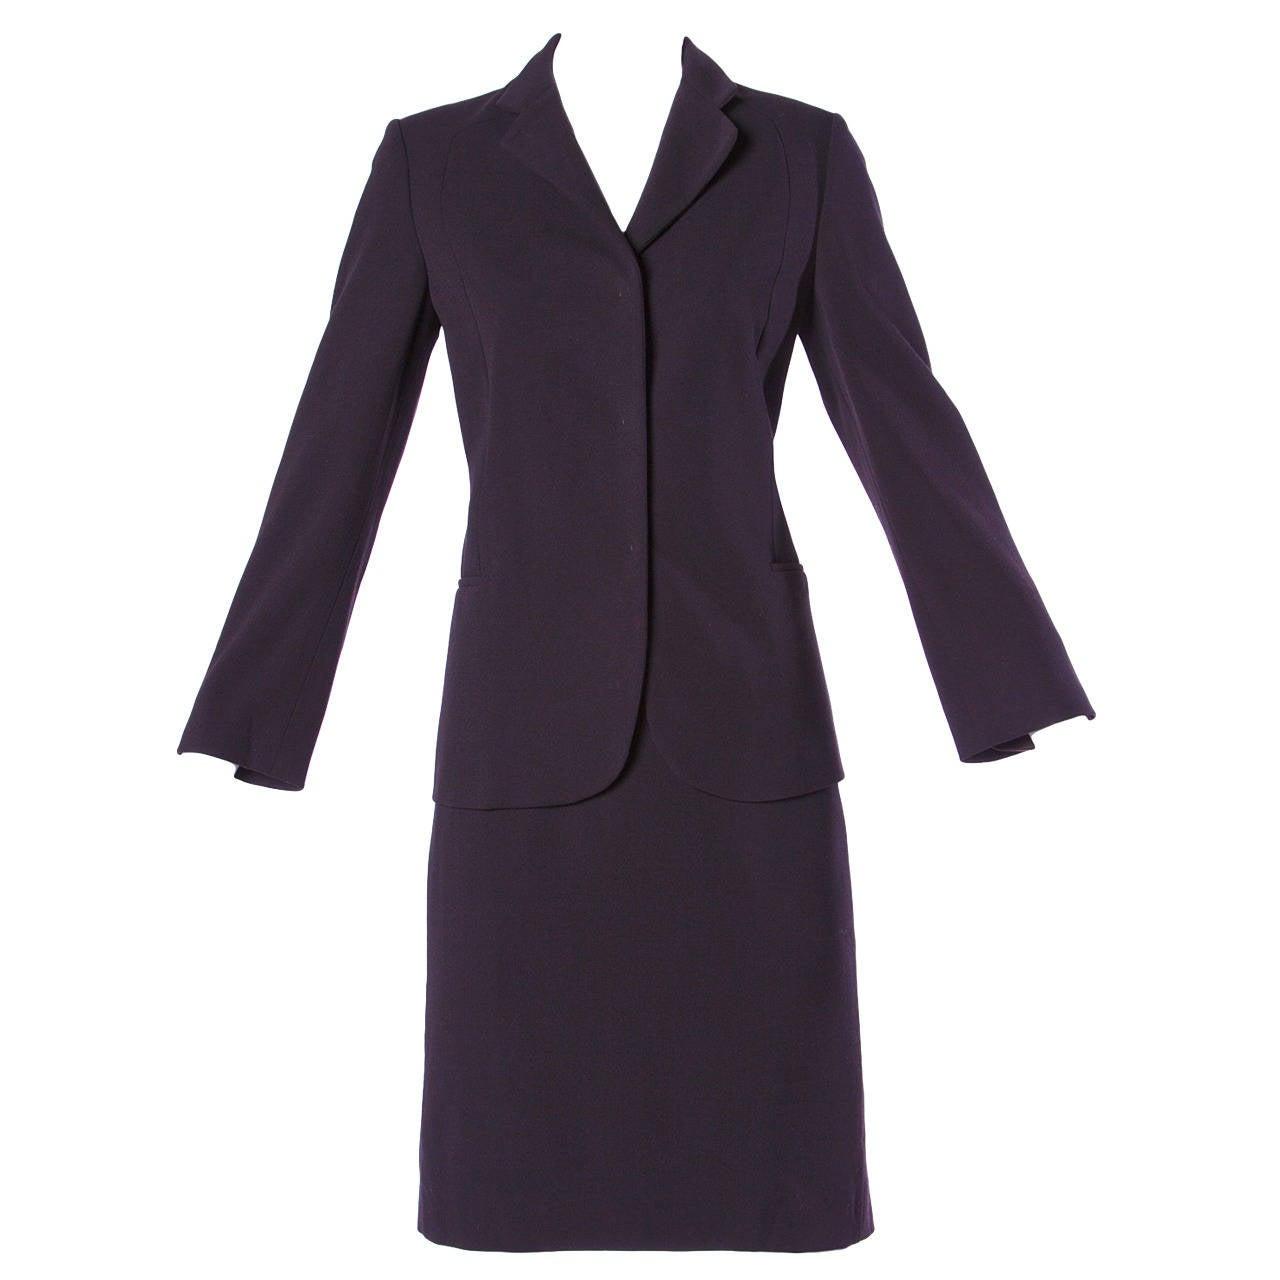 Jil Sander Vintage 1990s 90s Minimalist Brown Skirt + Jacket Suit Ensemble